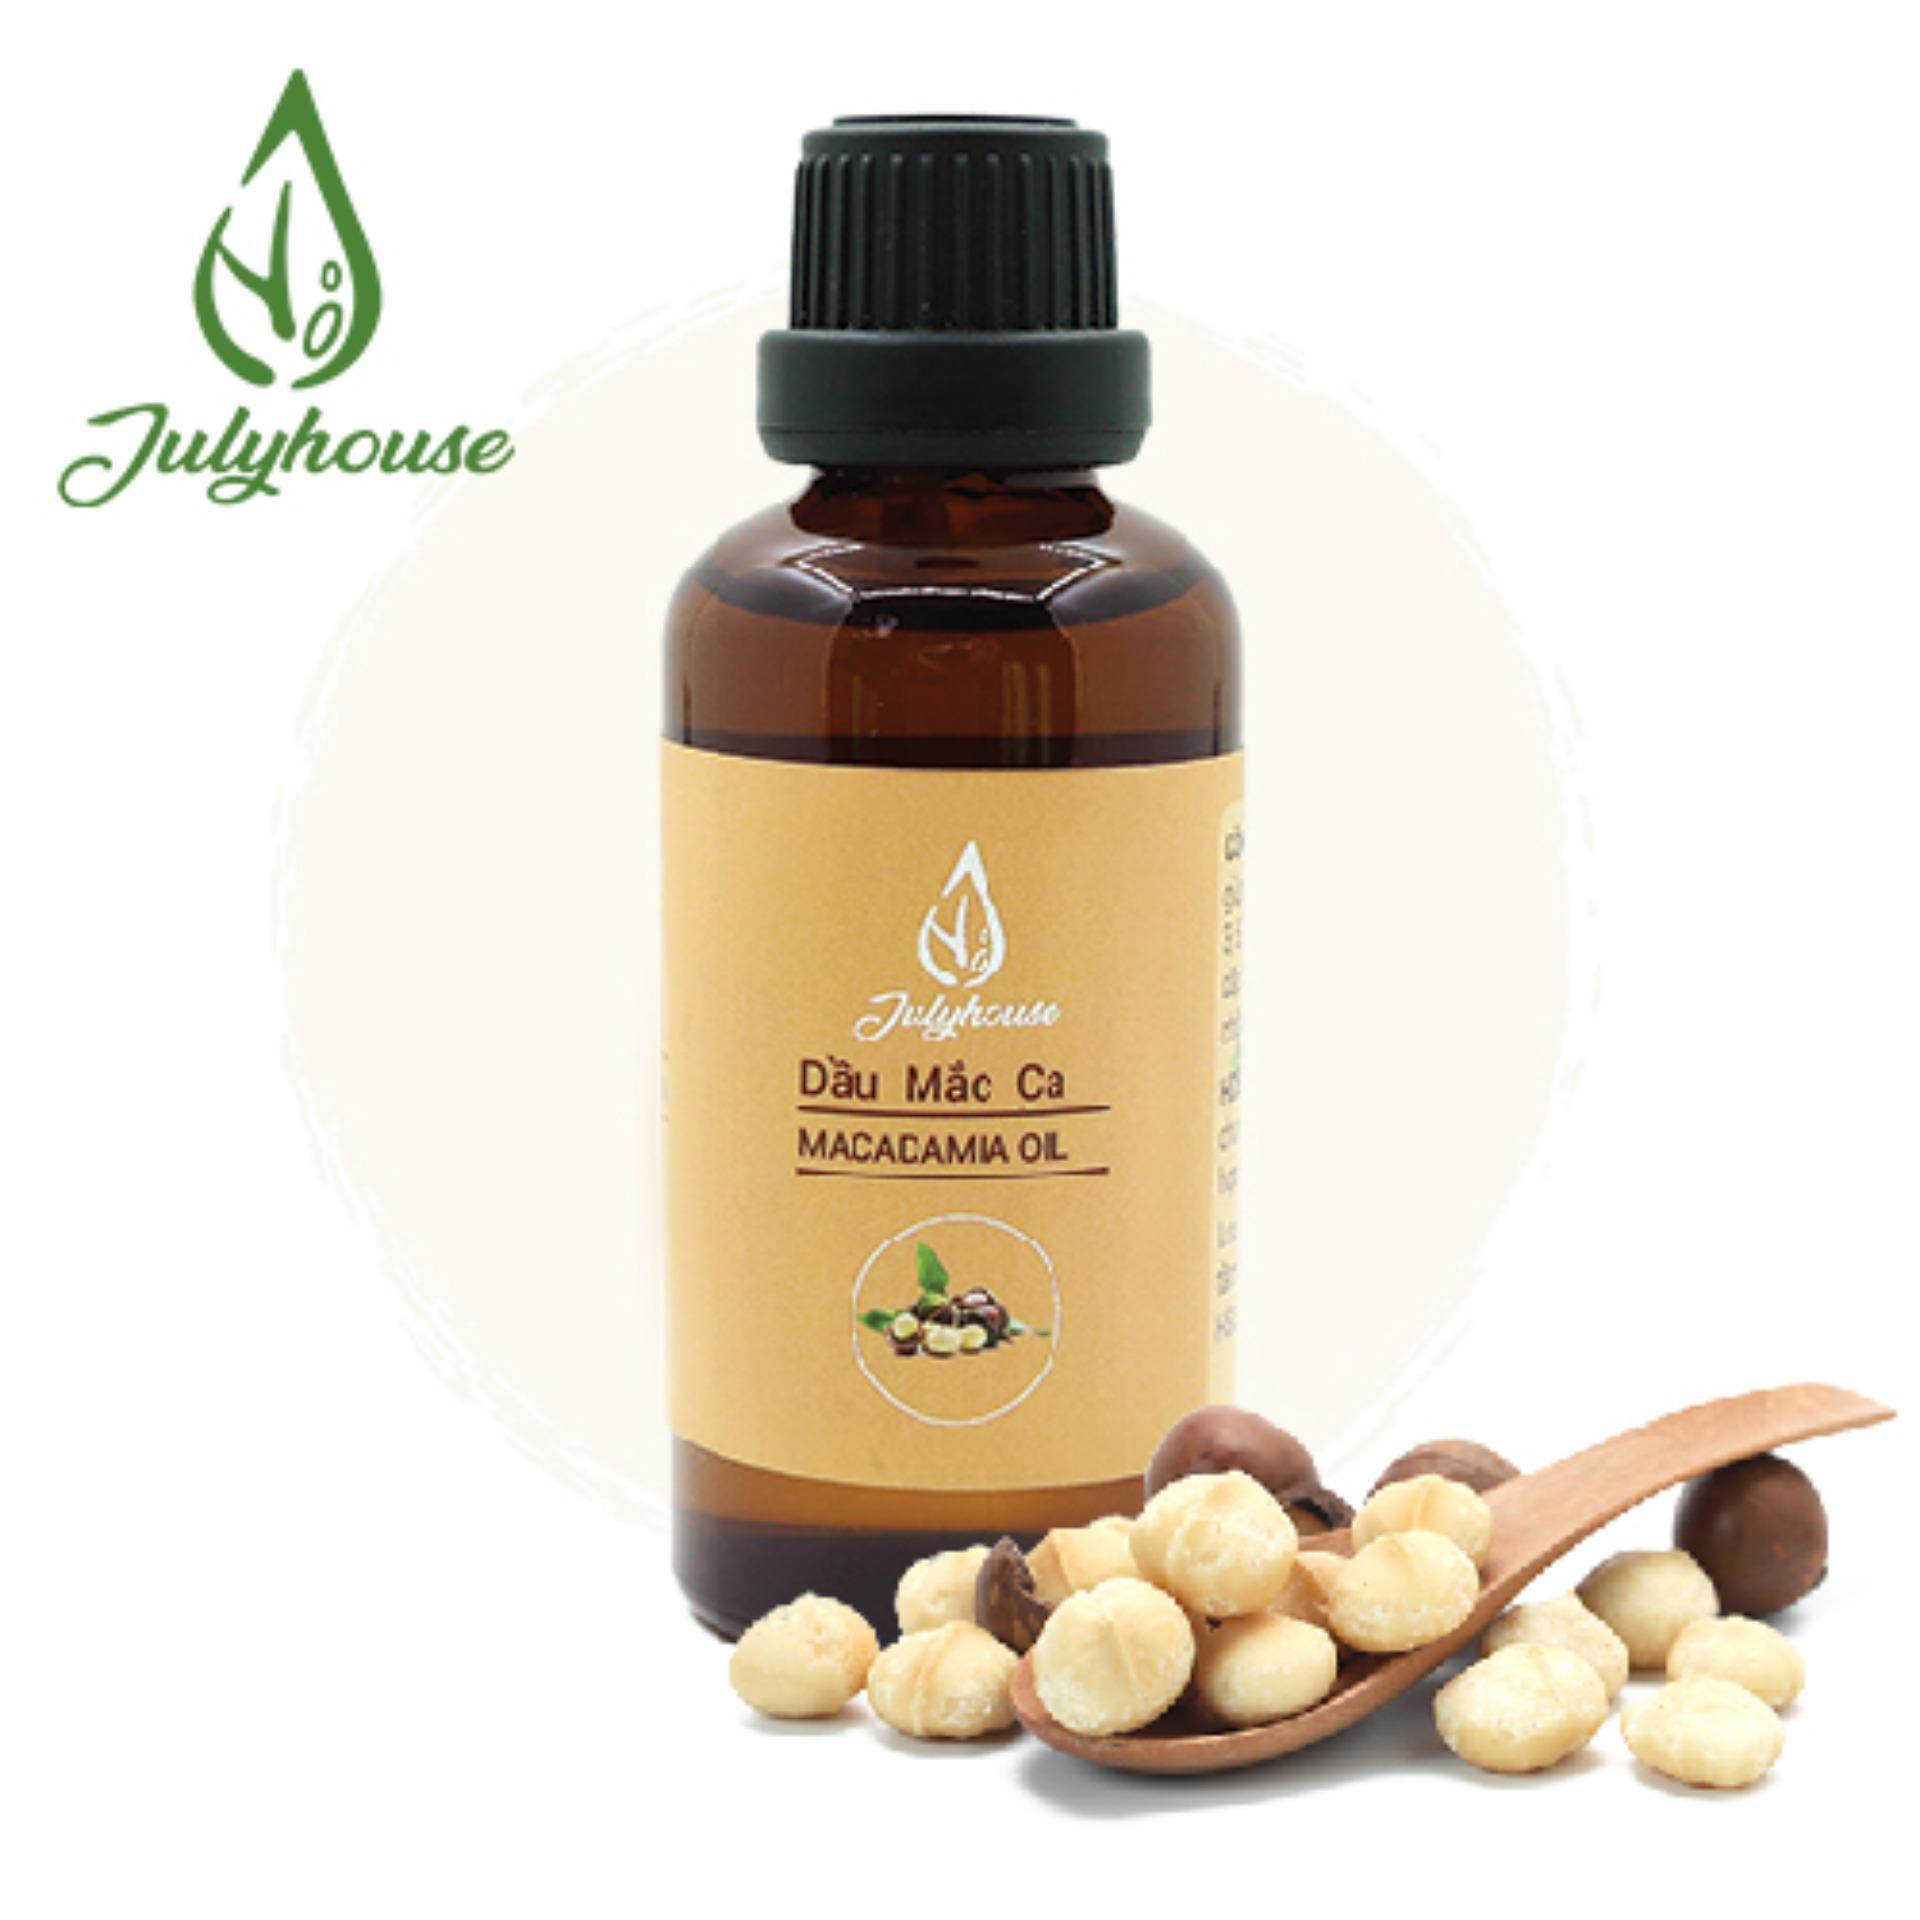 Dầu Macadamia Dưỡng tóc Julyhouse 30ml